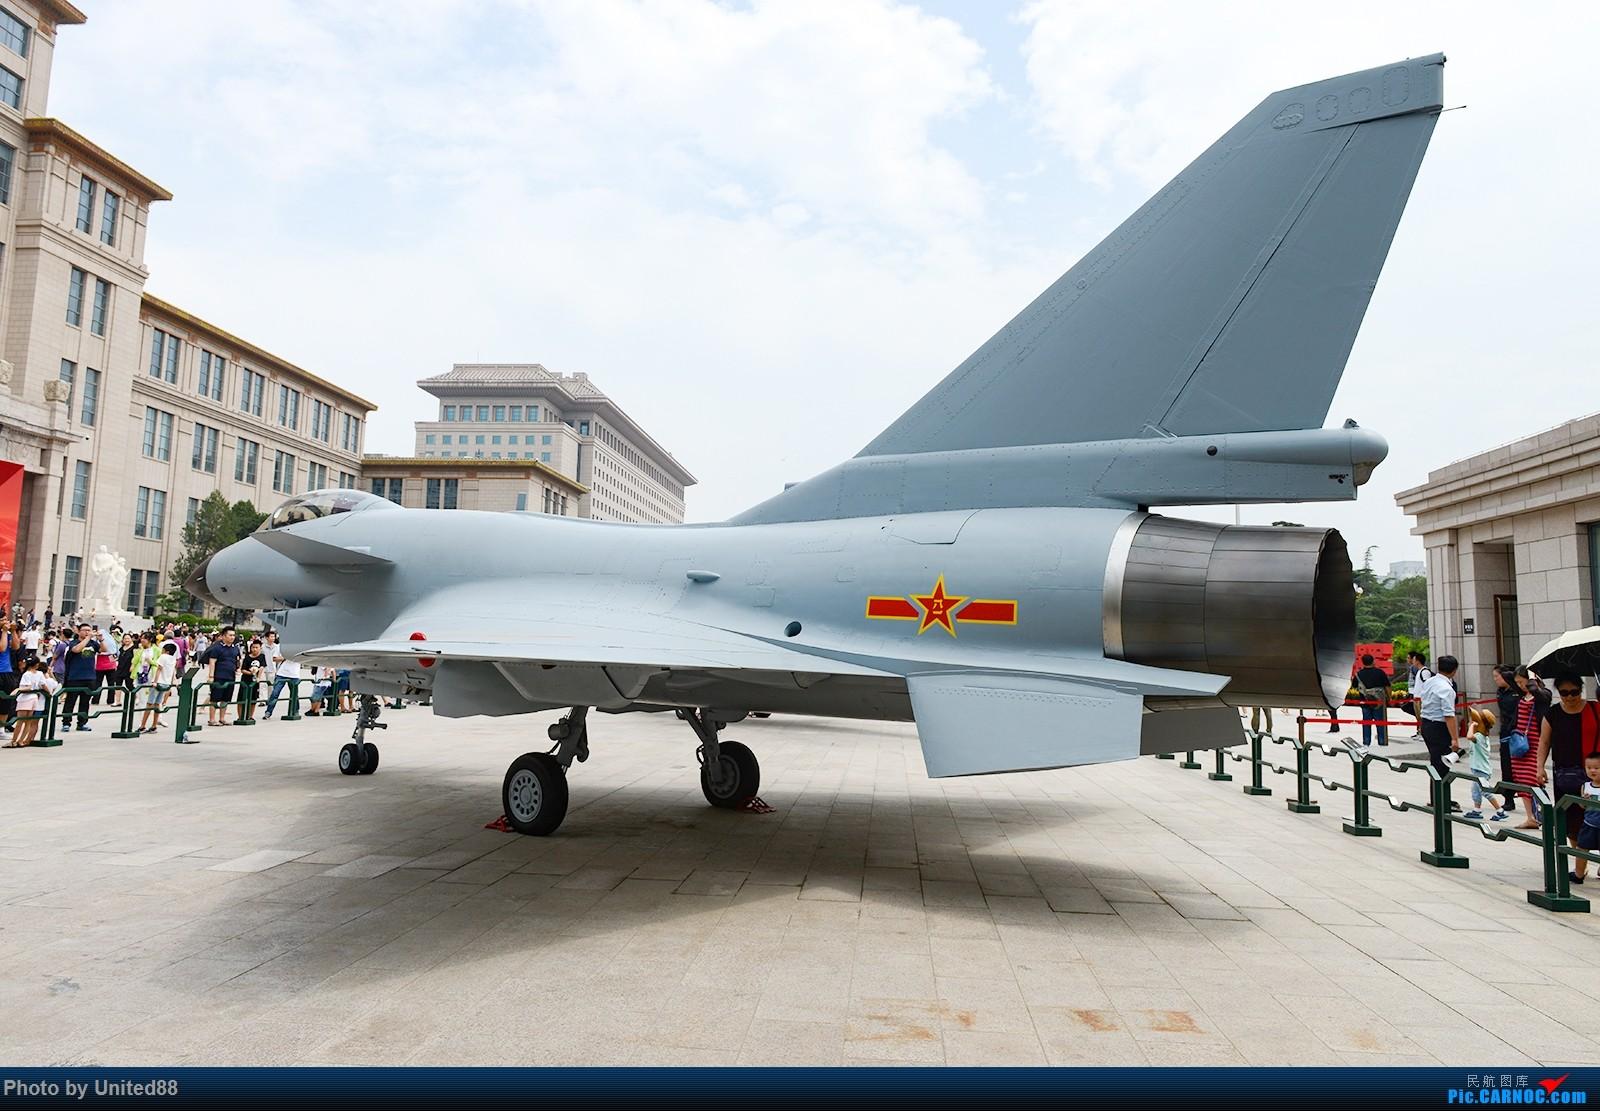 Re:[原创]纪念中国第三代战斗机歼10首飞20周年! J-10A 00 中国人民革命军事博物馆